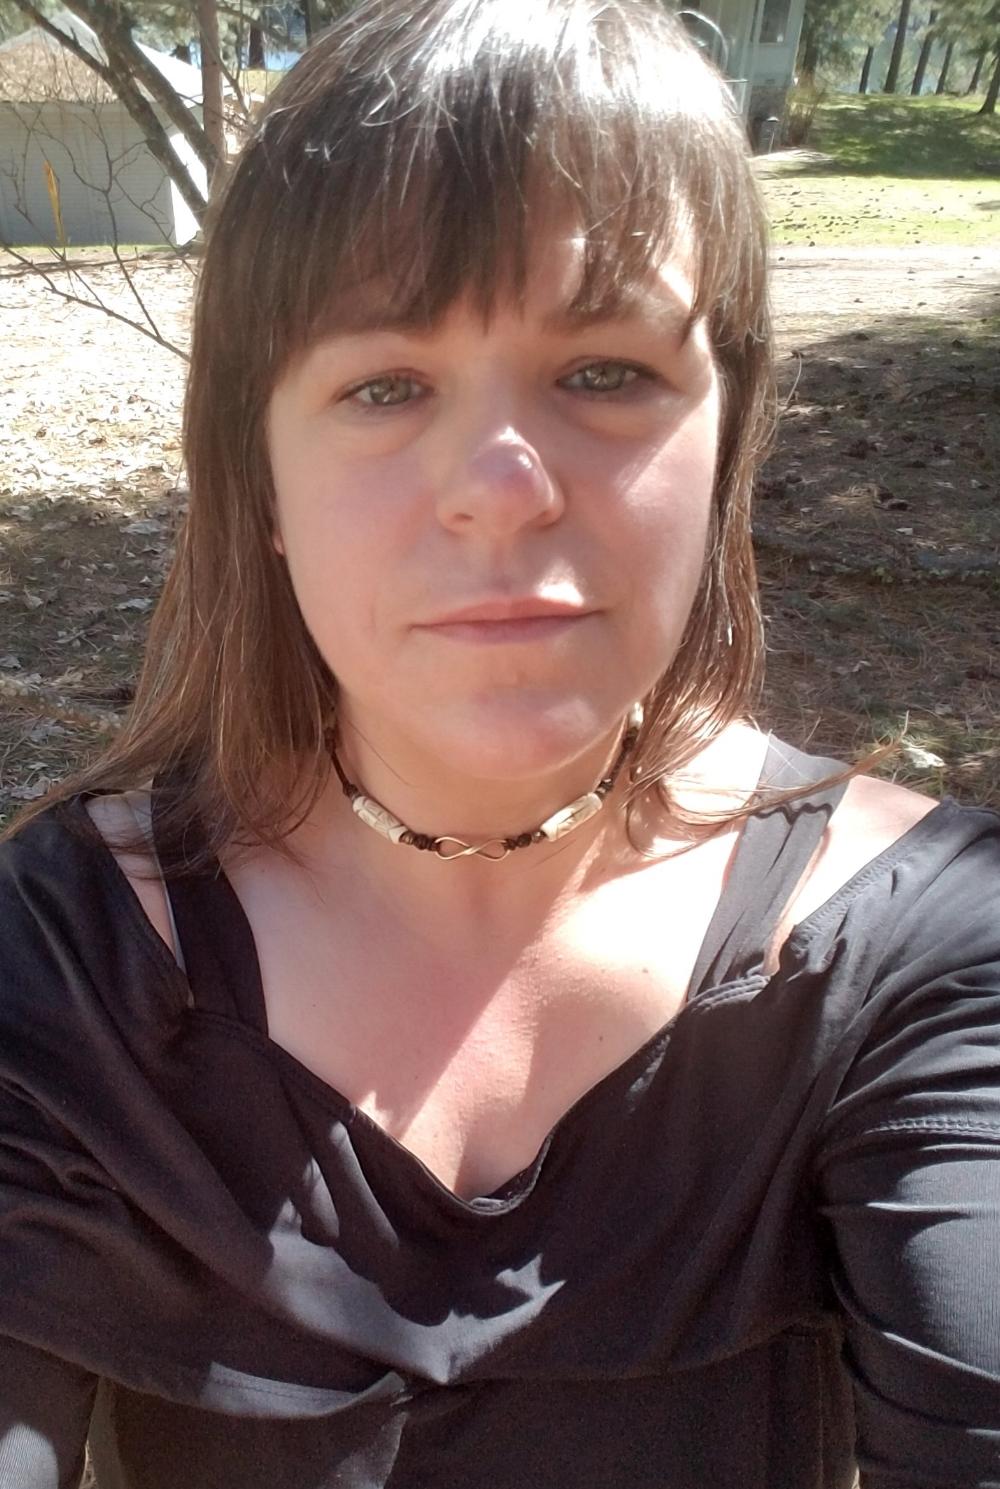 Anne Blakemore - 40453 North Shore DriveLoon Lake, Washington USA(509) 951-5907expressyouroils@gmail.com